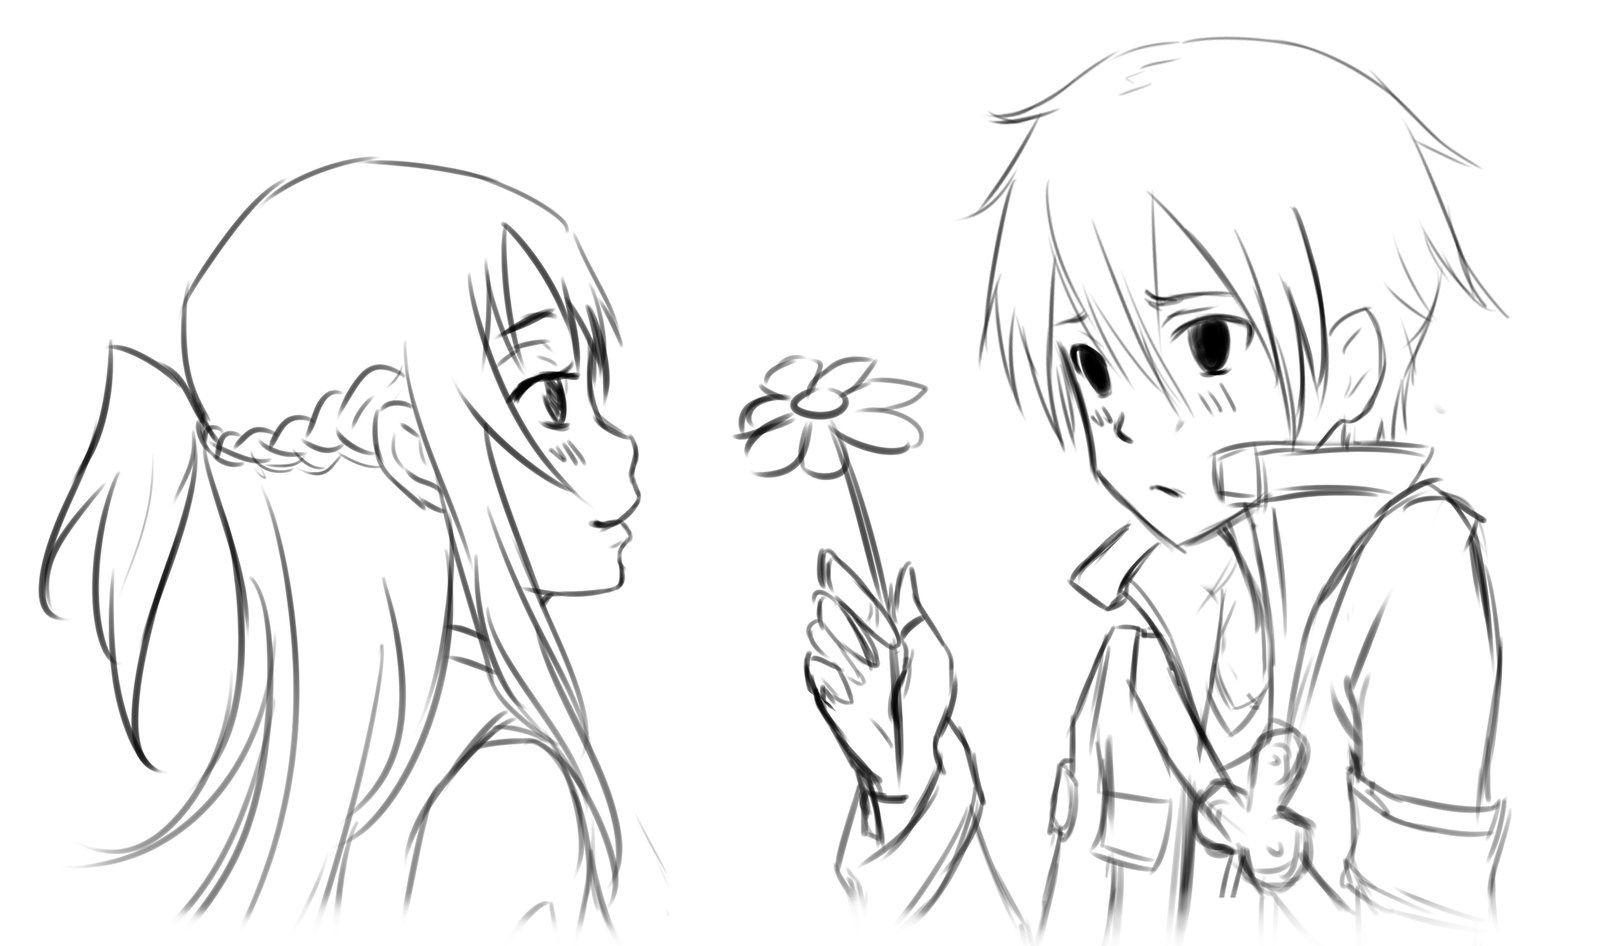 Kirito Asuna Anime-Couple-Coloring-Pages  K21 Worksheets  Manga